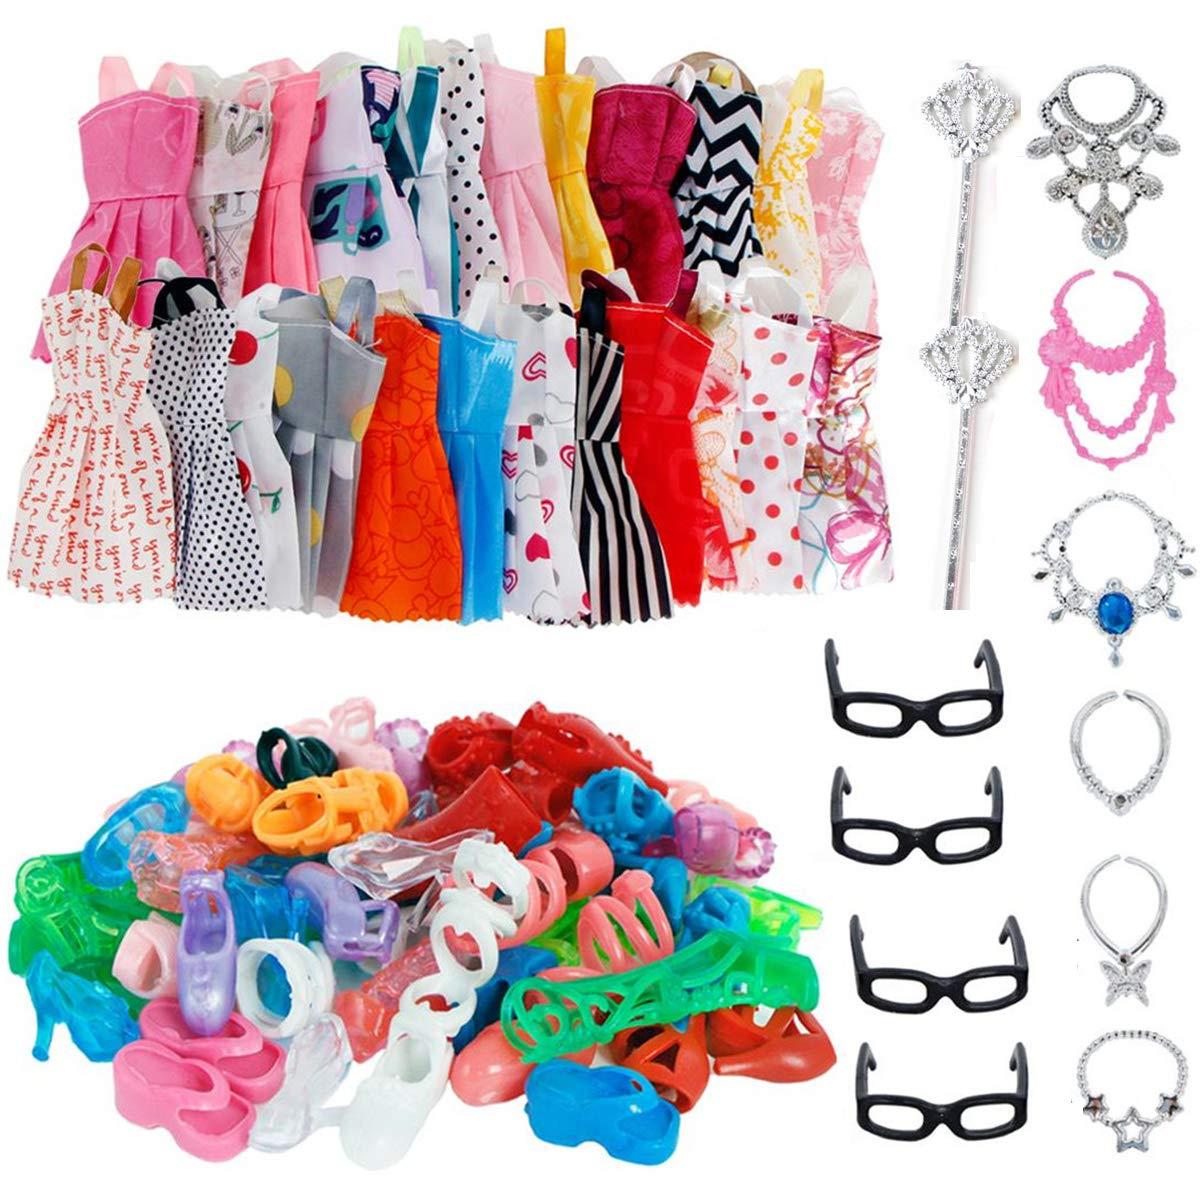 AMETUS 32 PCS Doll Accessories, 10x Mix Cute Dresses, 10x Shoes, 4X Glasses, 6X Necklaces, 2X Fairy Sticks Dress Clothes for 11.5 inch Doll